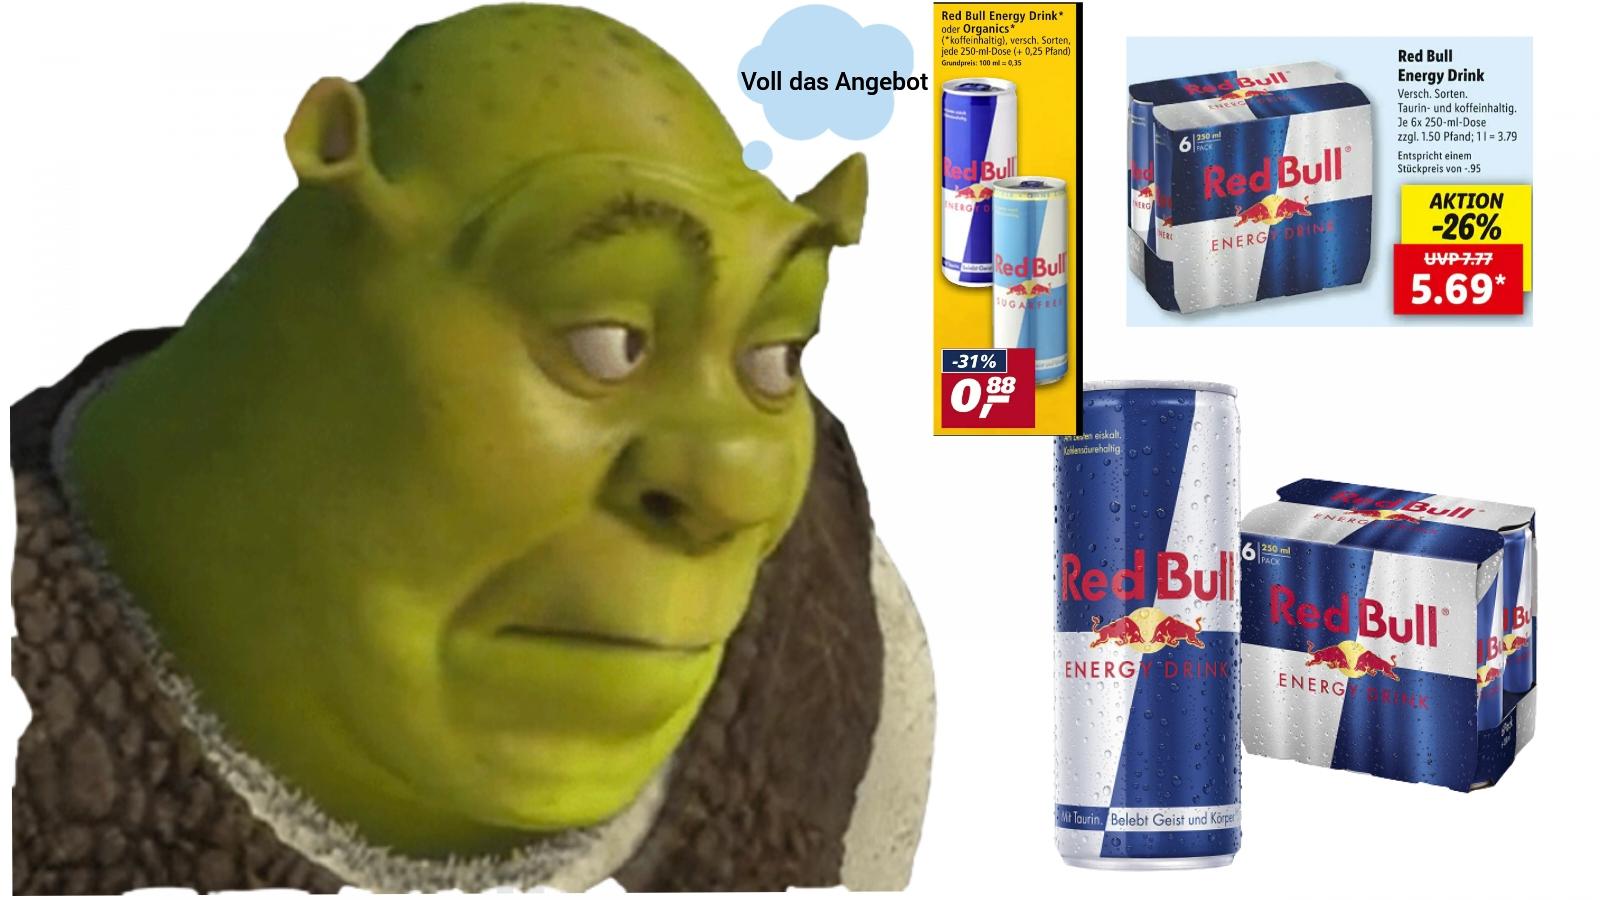 Energy Drink Angebote vom 08.03 - 13.03 z.B. Red Bull Energy Drink 6 x 250ml für 5,28€ im Real ab dem 11.03